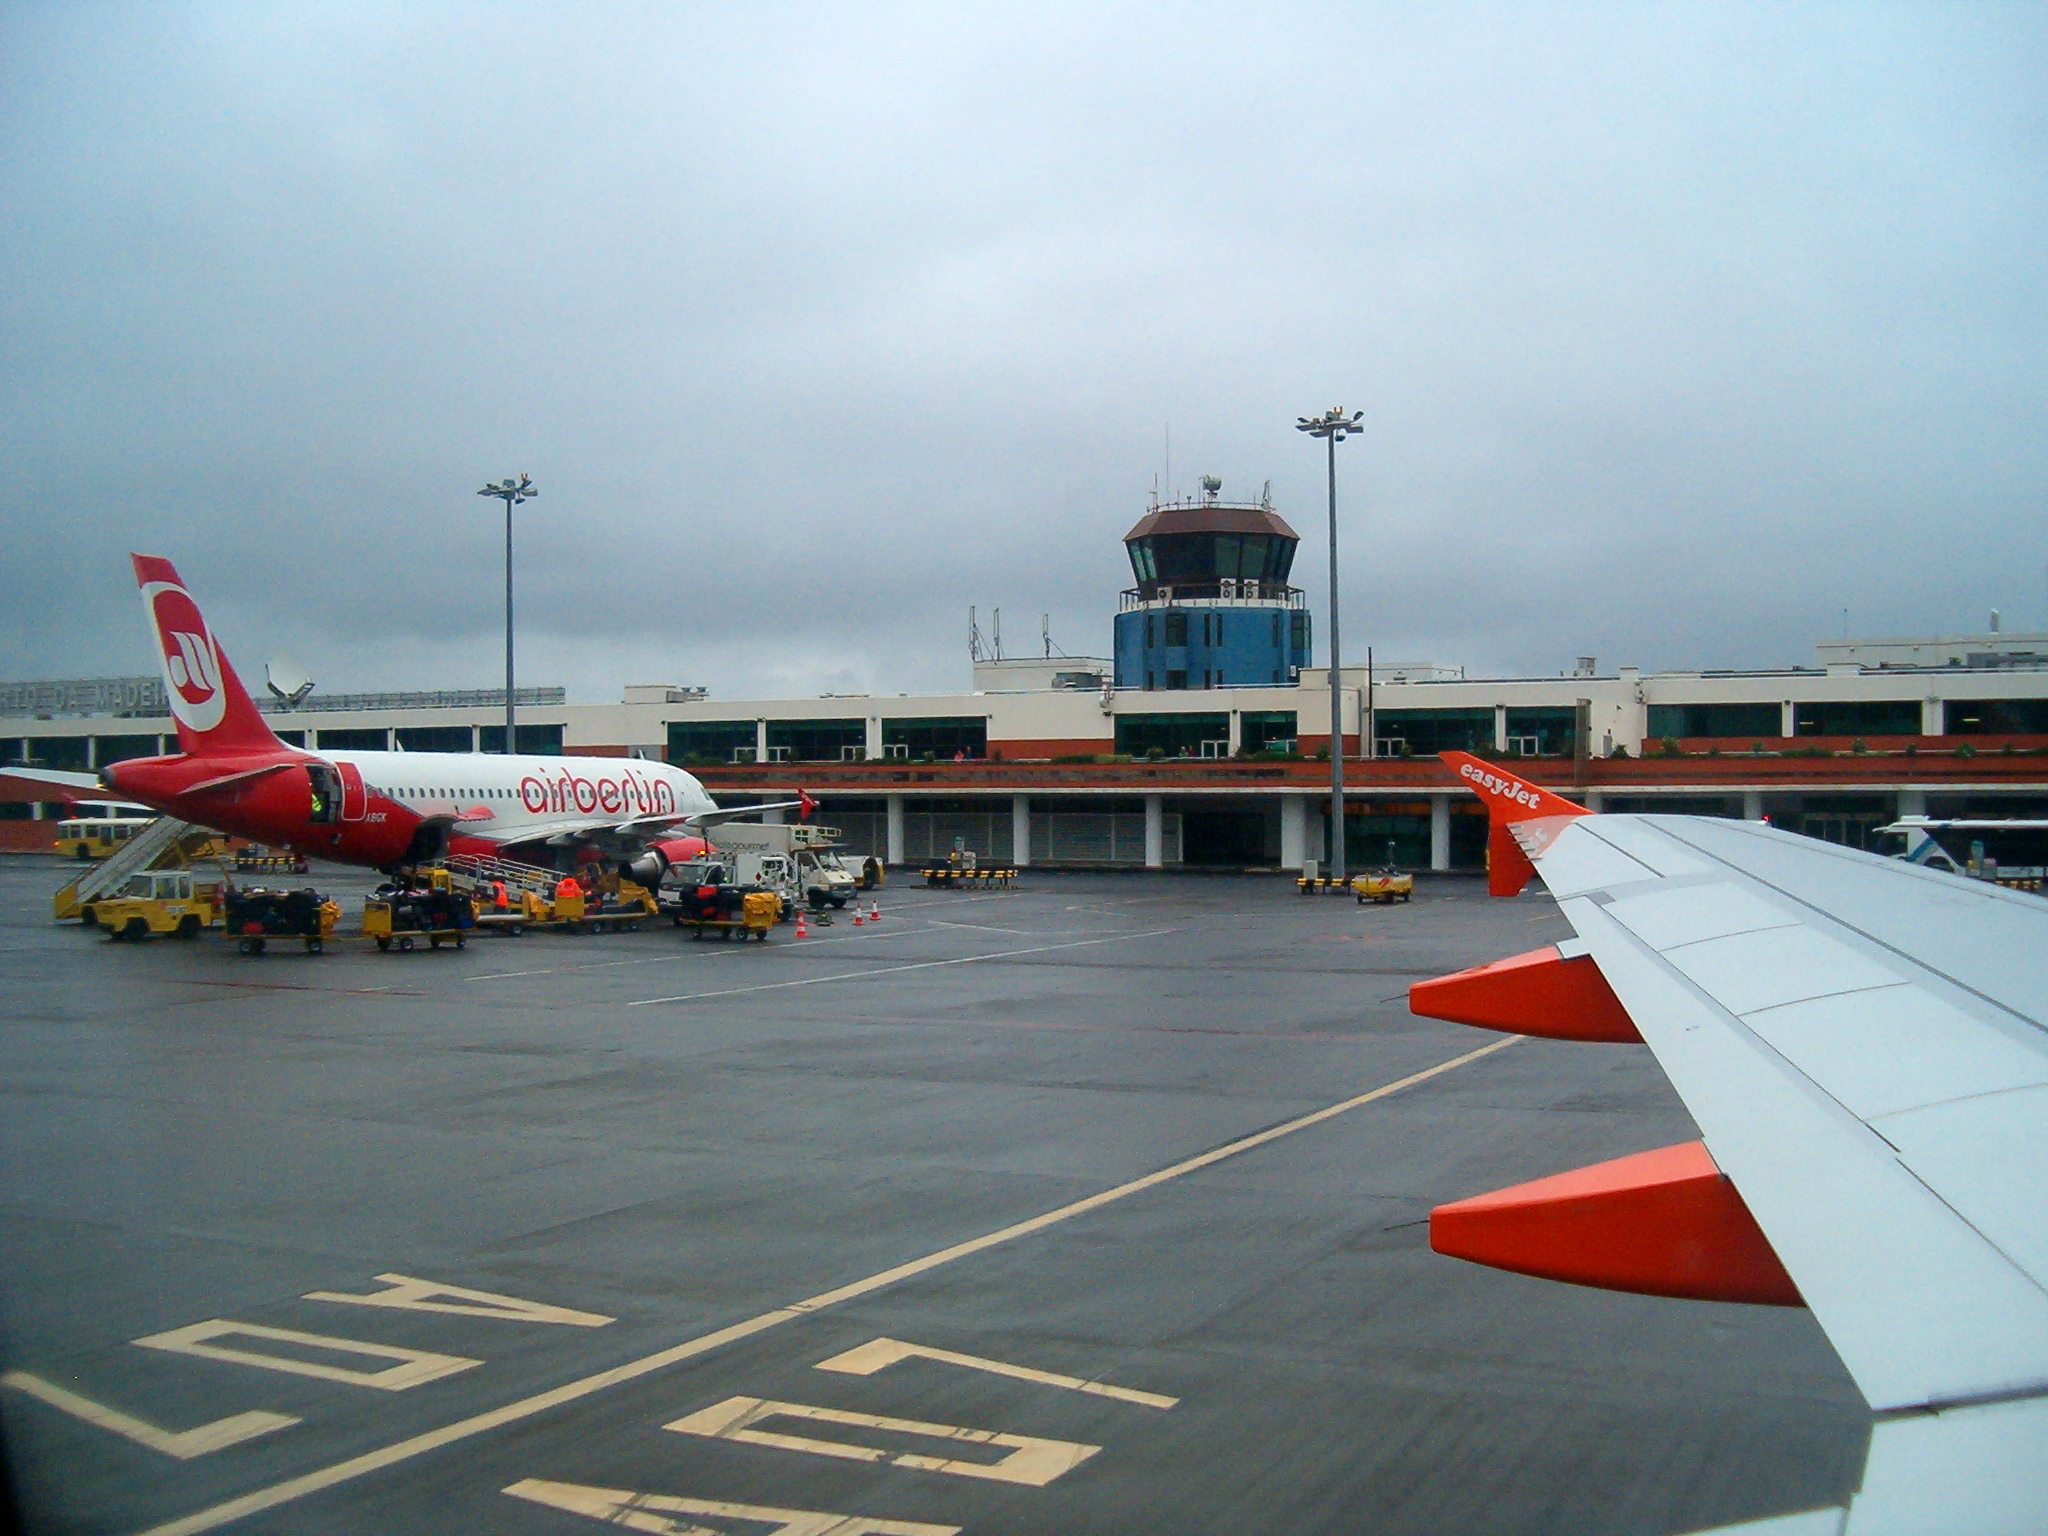 مطار كريستيانو رونالدو